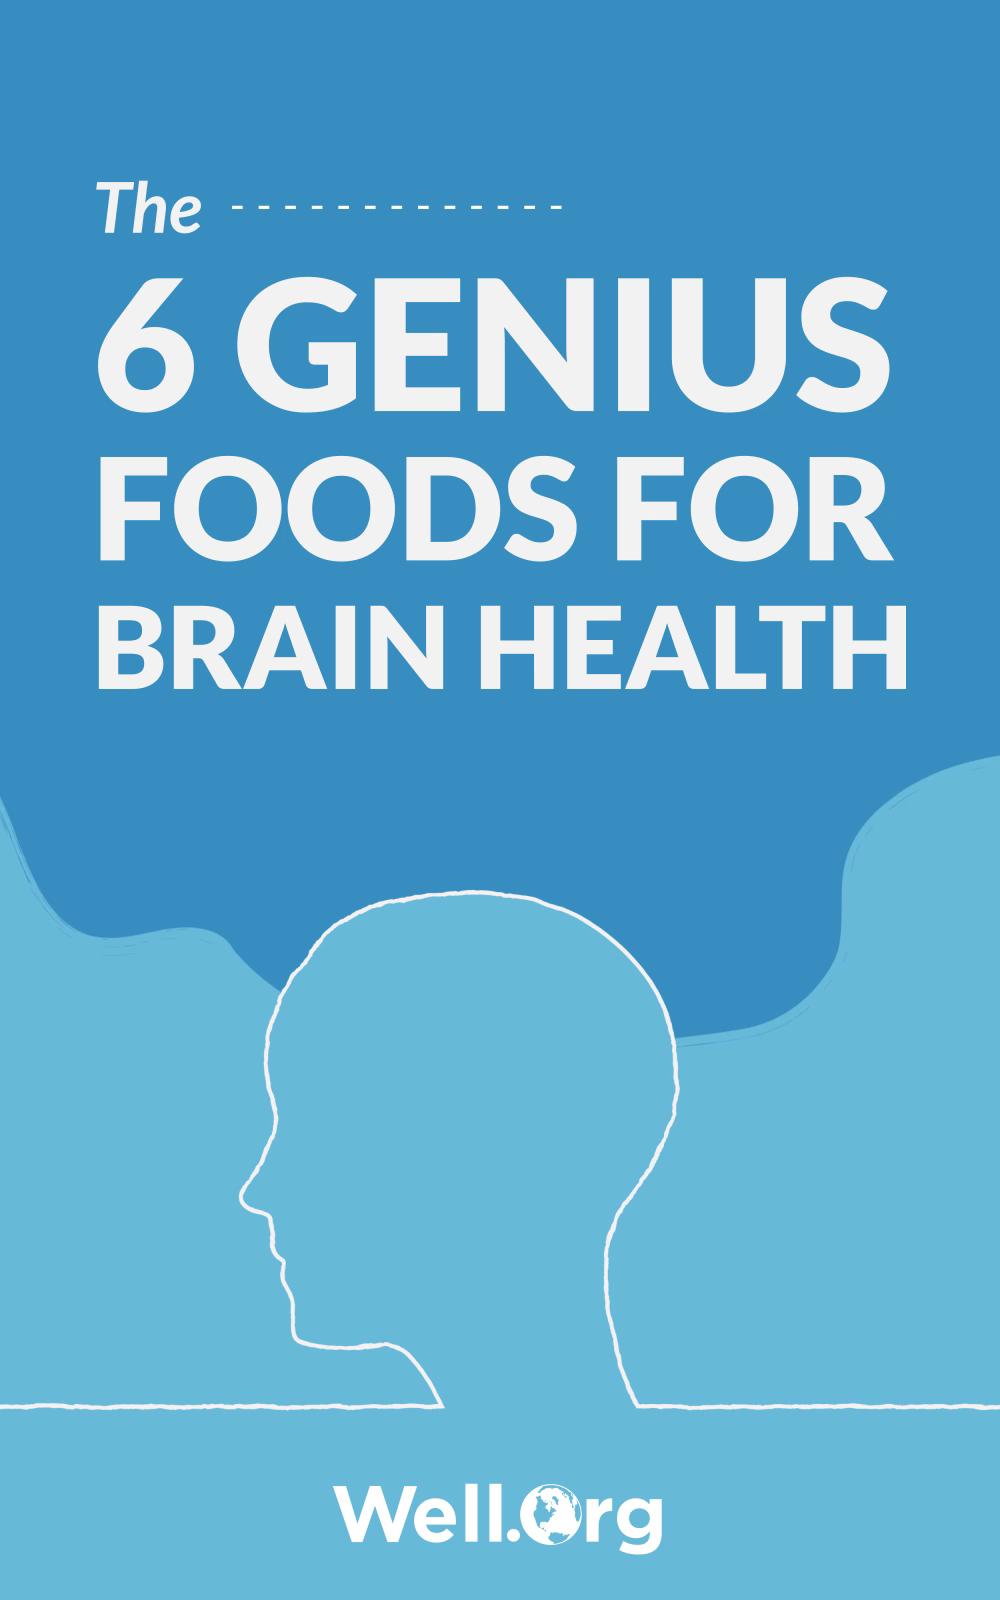 Genius Foods – 6 Superfoods For Brain Health [INFOGRAPHIC]